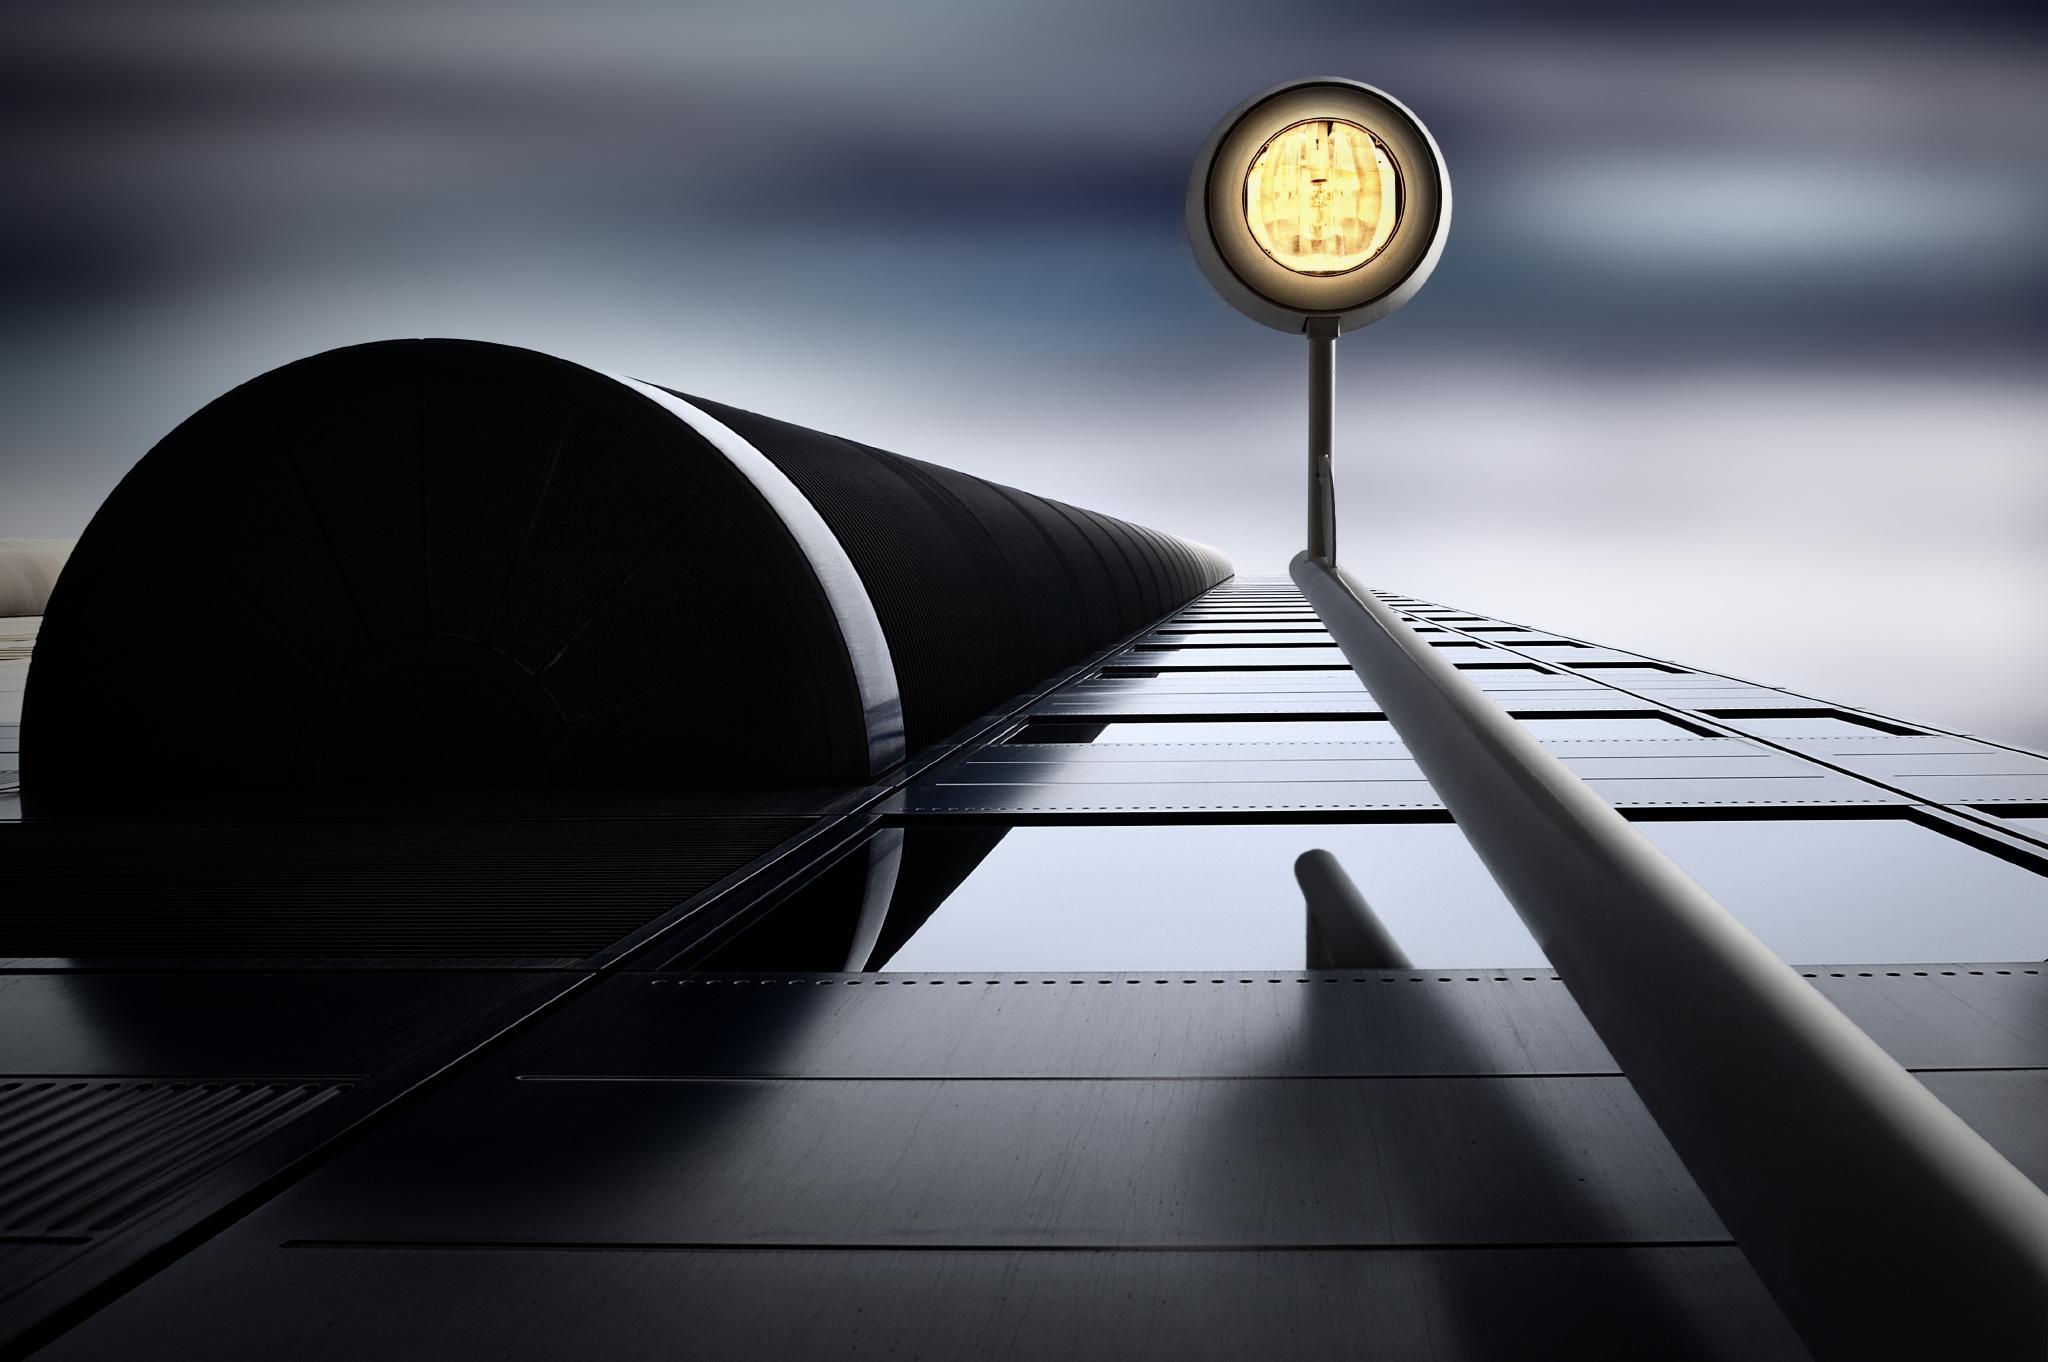 A Hopeful Light